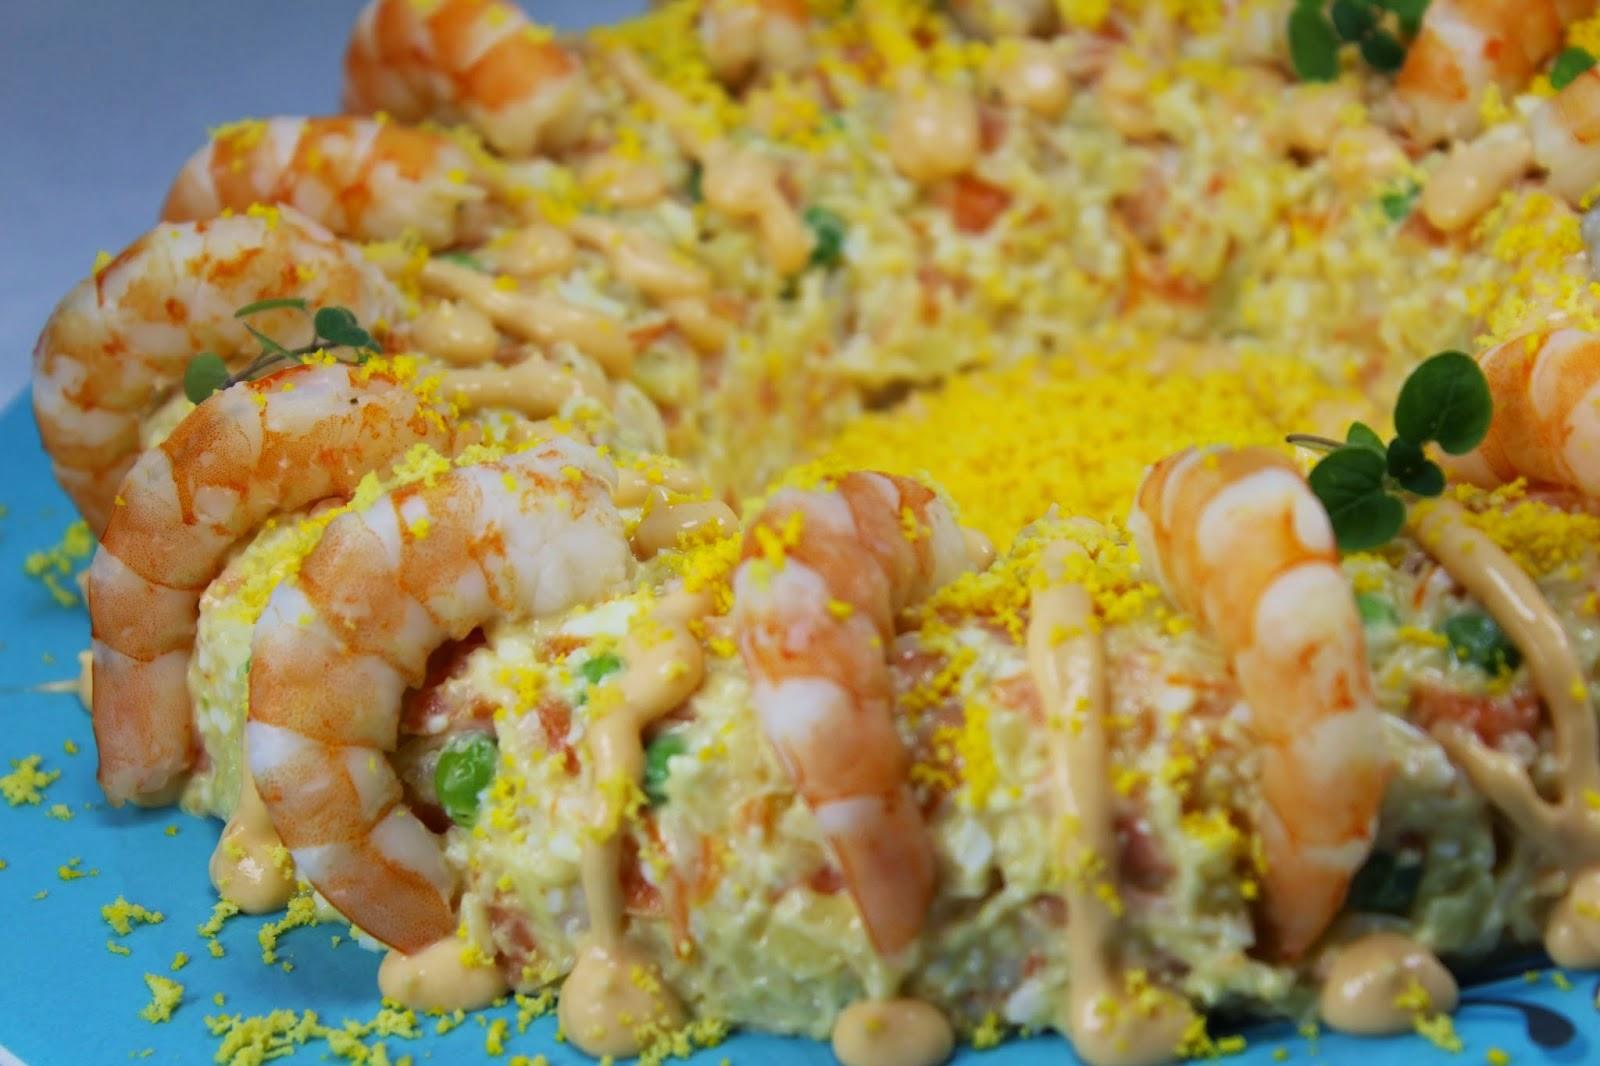 Ensaladilla de langostinos Ana Sevilla cocina tradicional